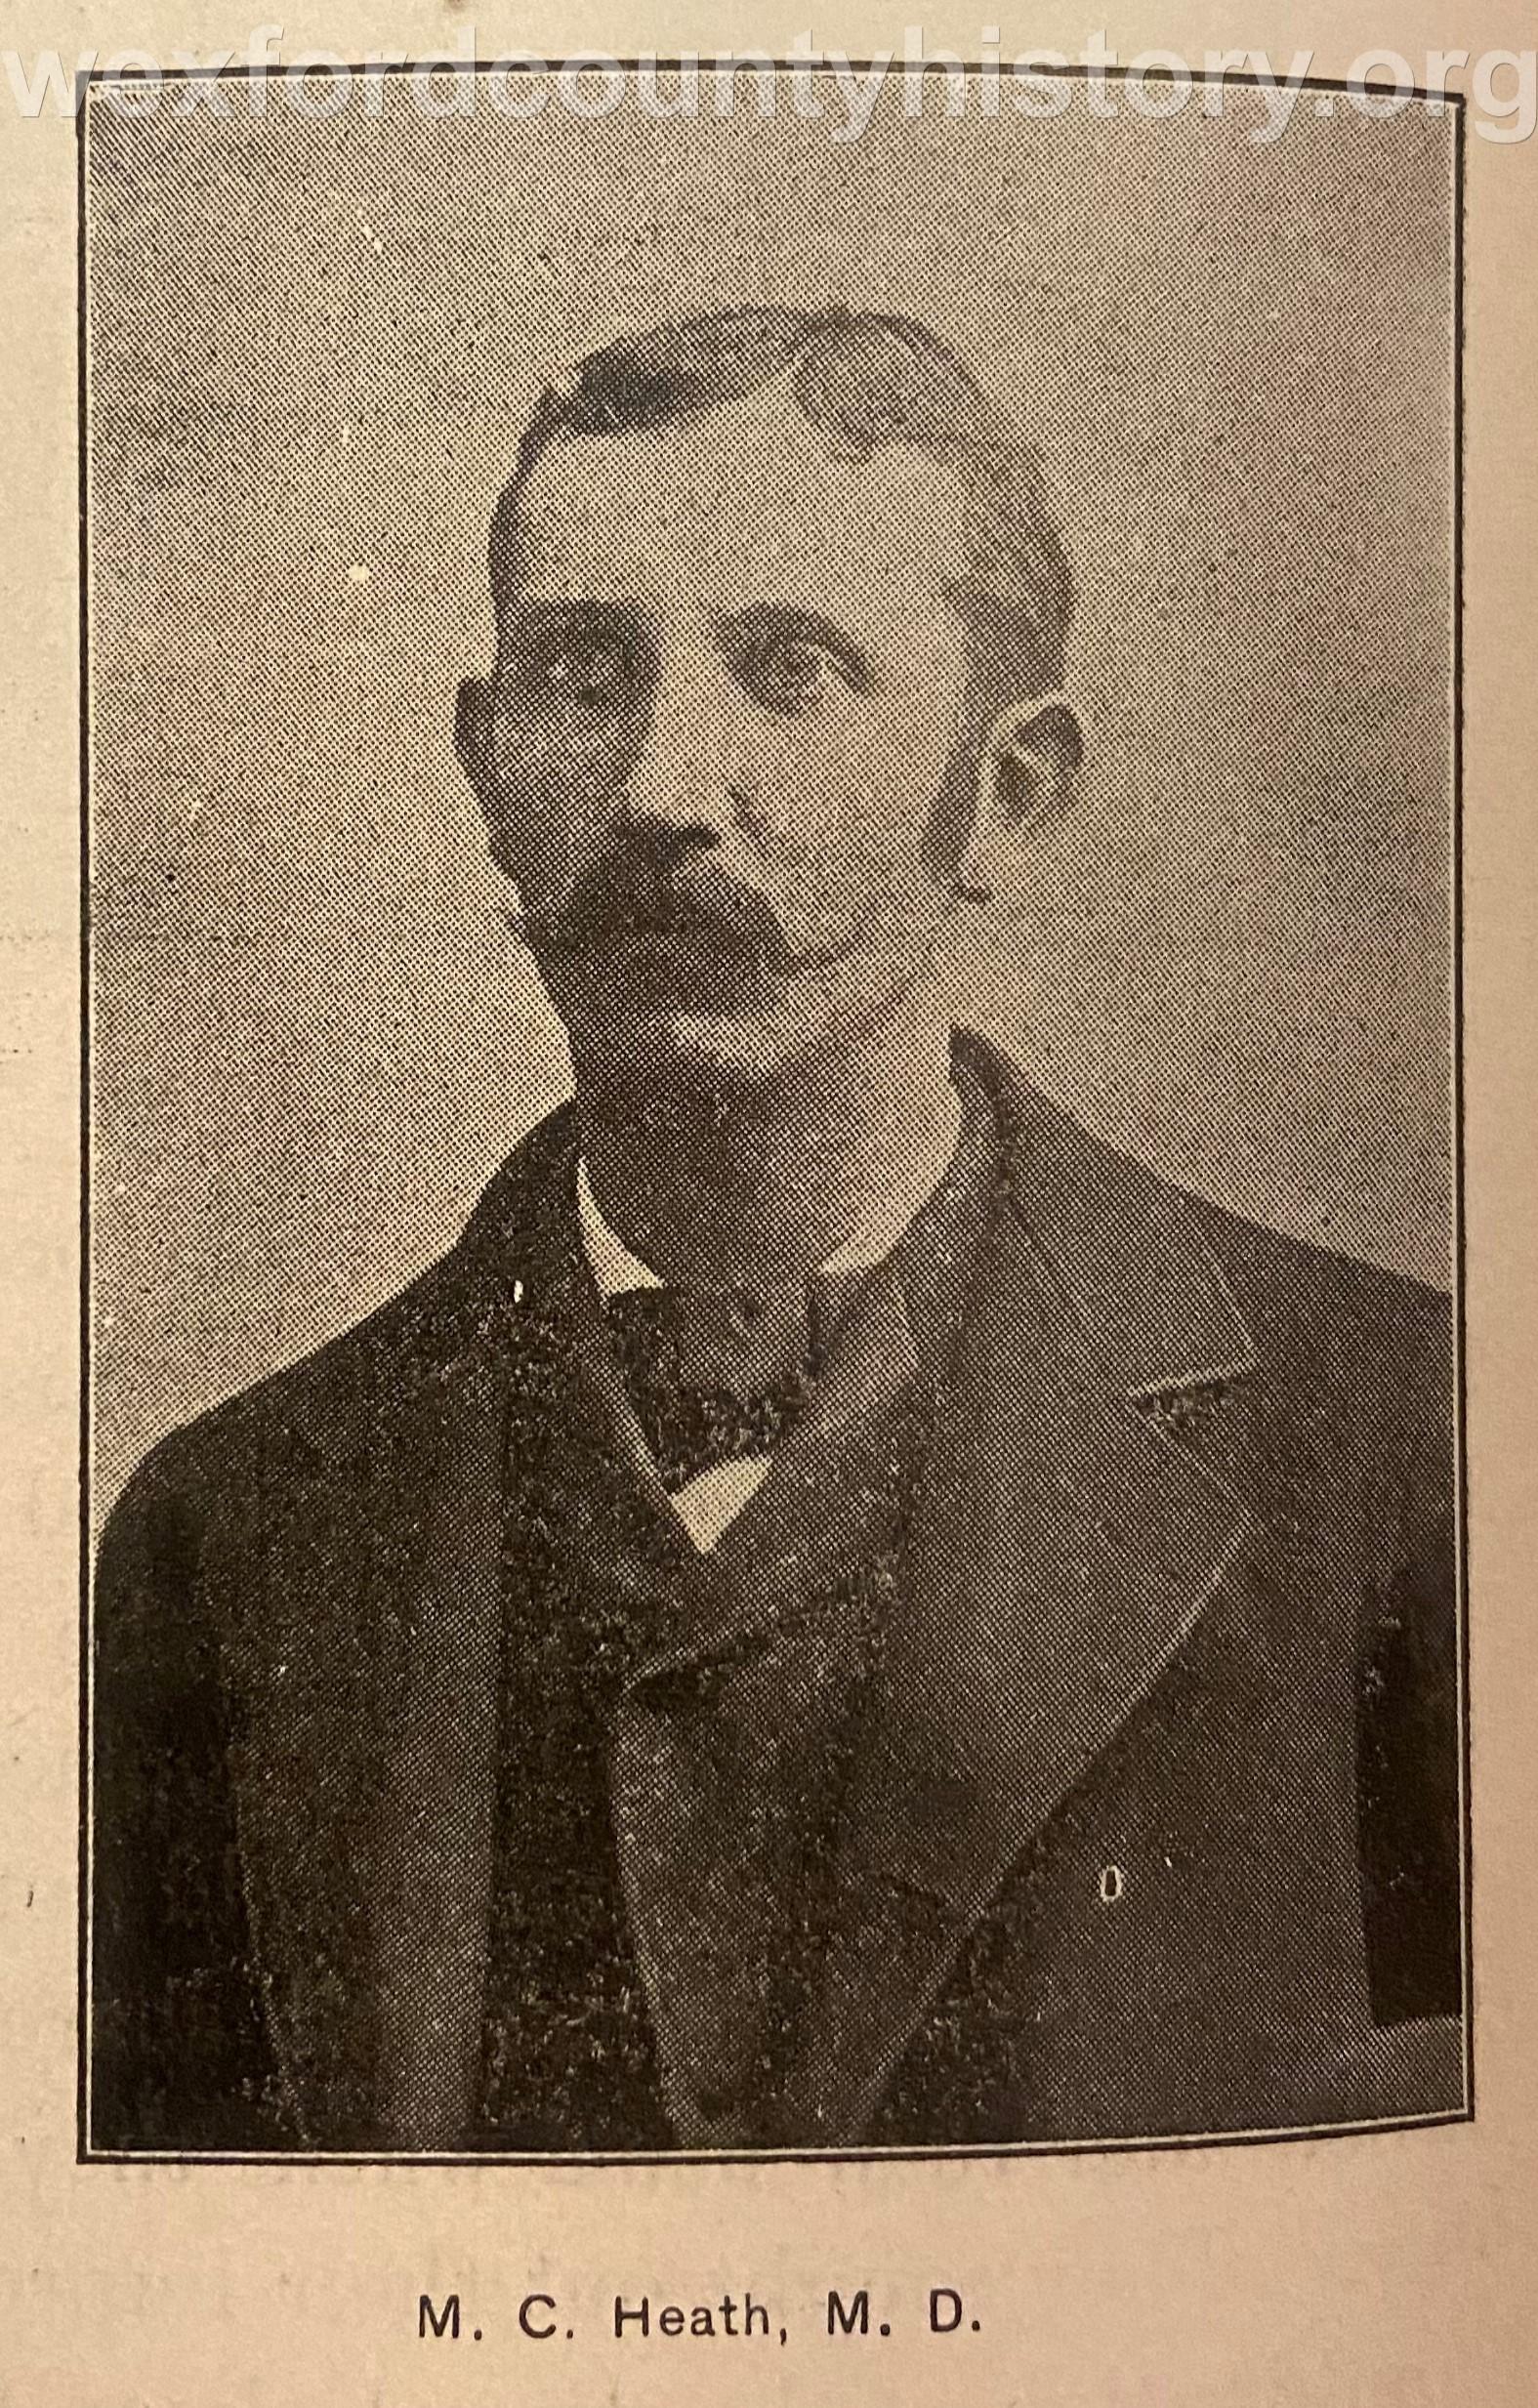 Dr. Mott C. Heath